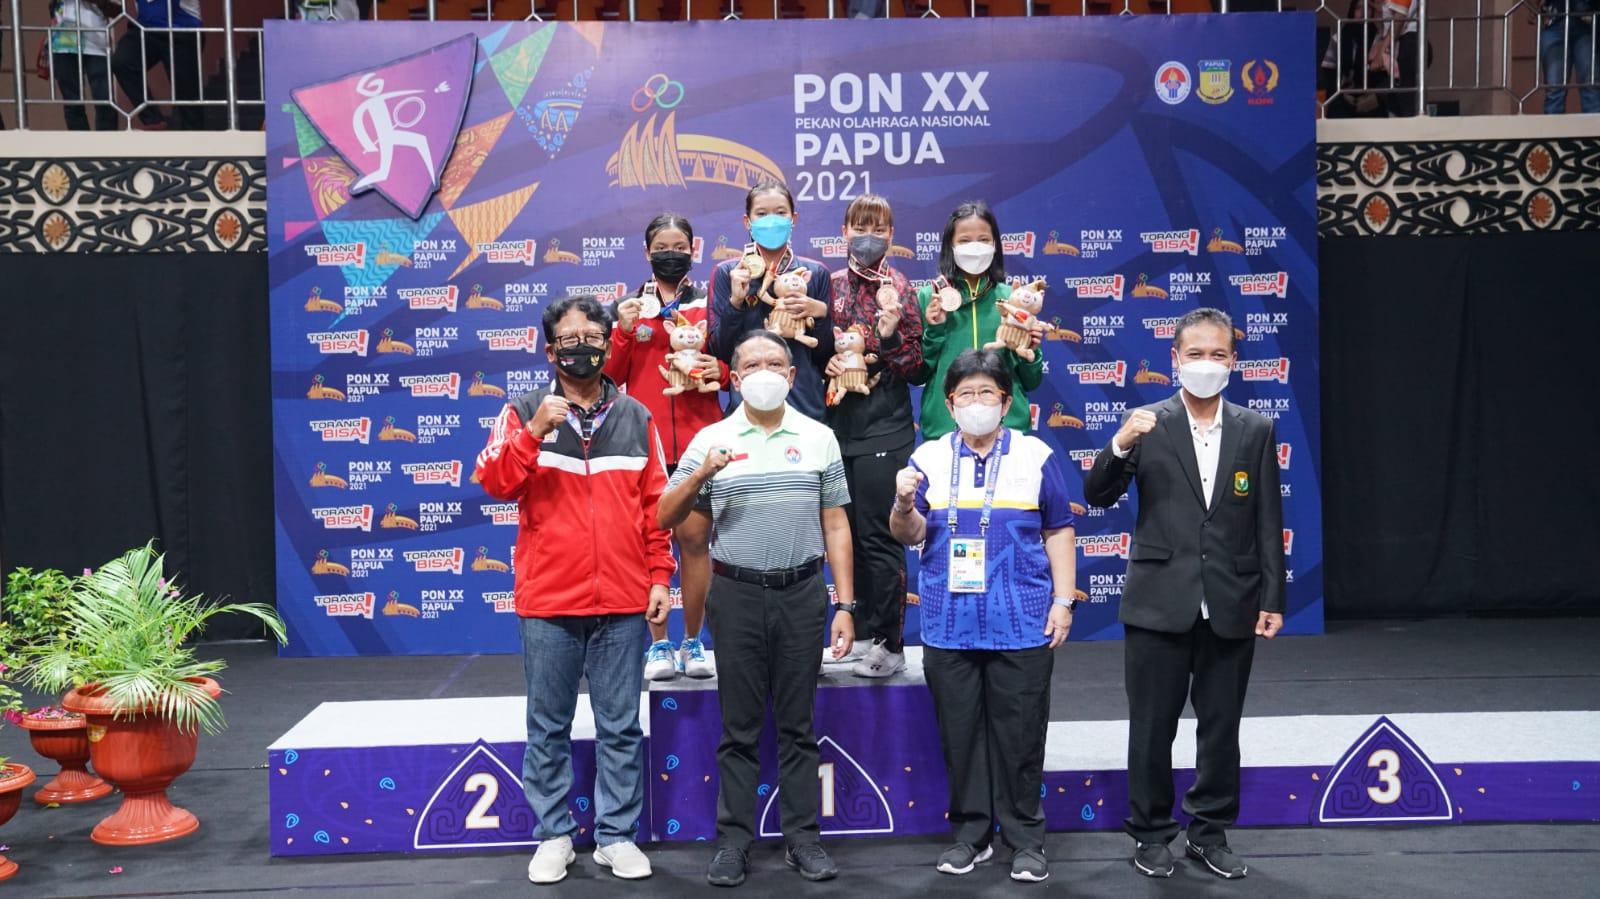 Klasemen PON XX, Jabar Masih Kokoh di Puncak Jelang Acara Penutupan, Bali Geser Jateng di Posisi Kelima